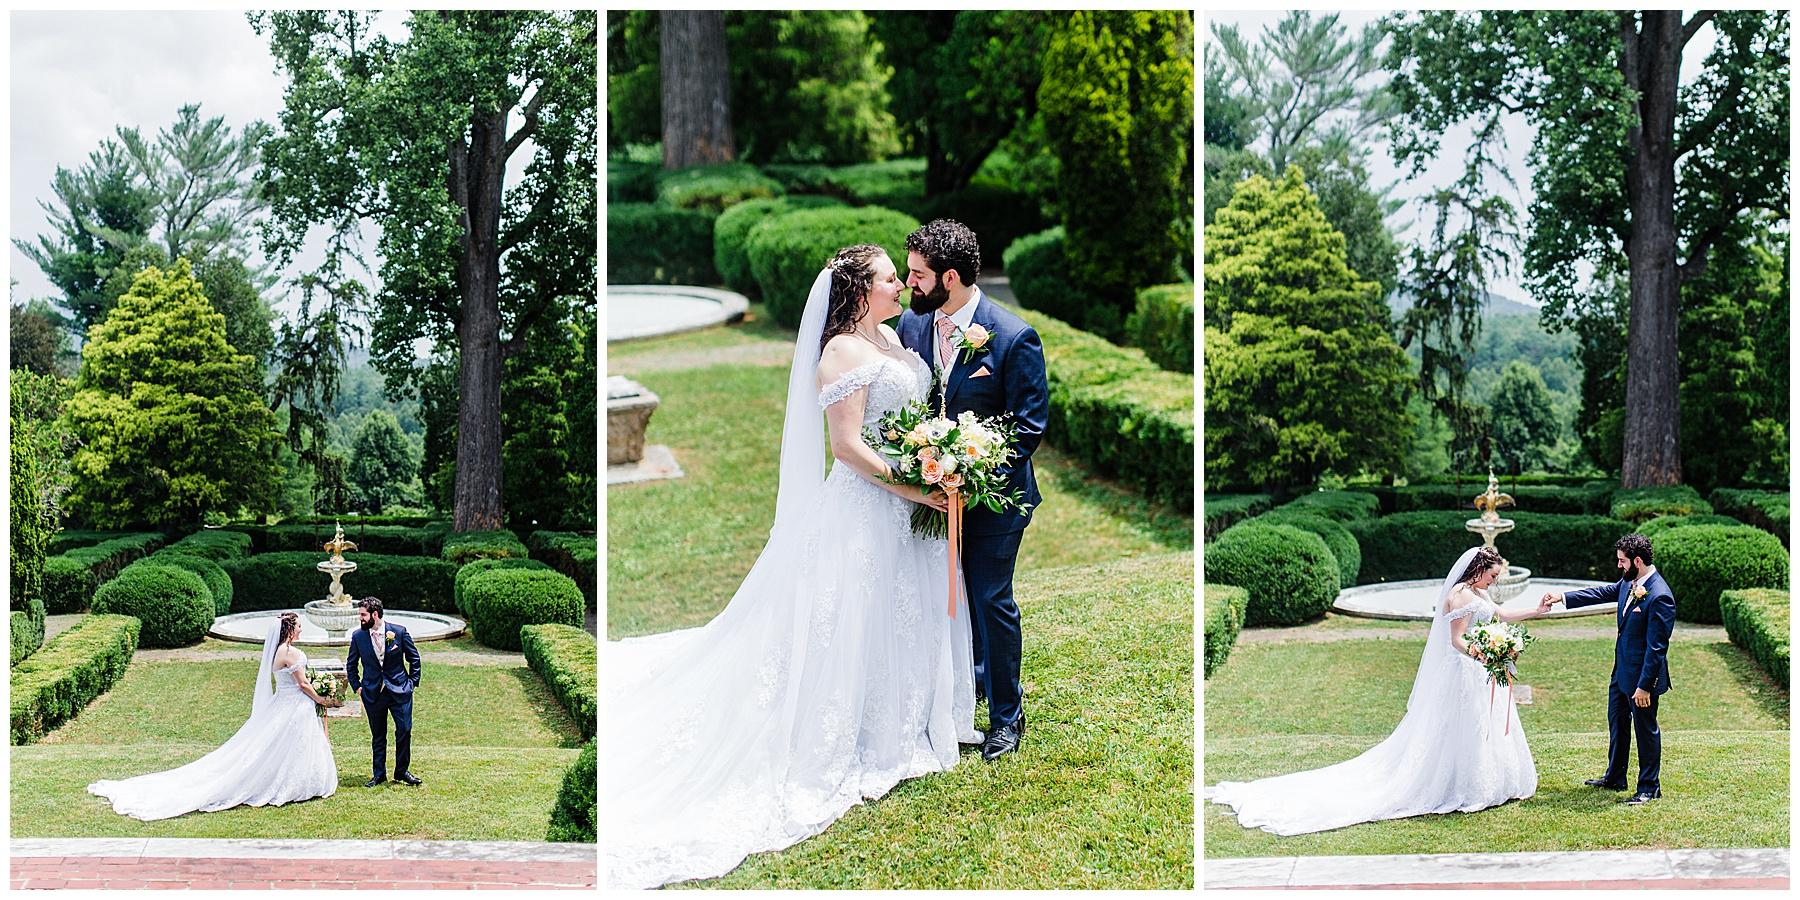 oak-ridge-estate-wedding-virginia-photographer16.jpg